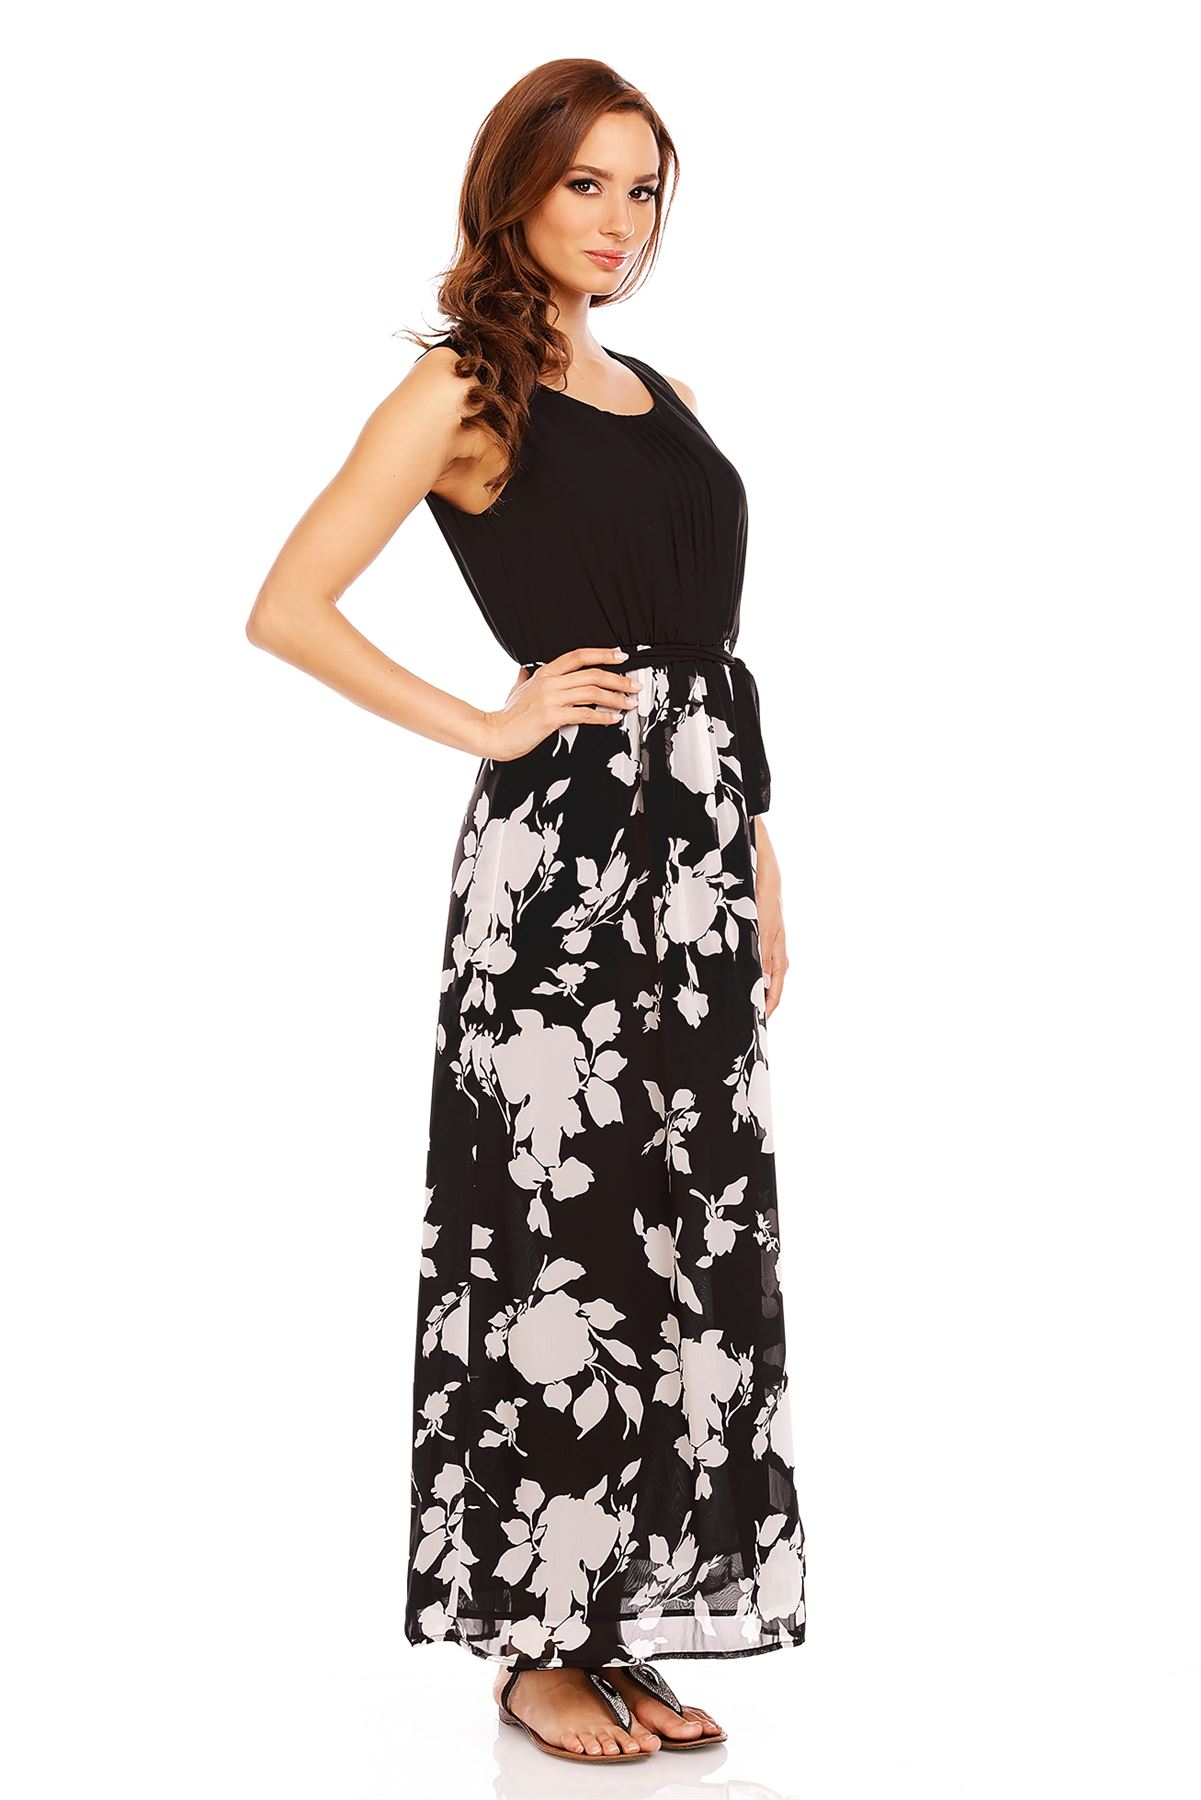 Model Fashion Womens Polka Dots Maxi Long Casual Summer Beach Party Tank Dress Belted | EBay